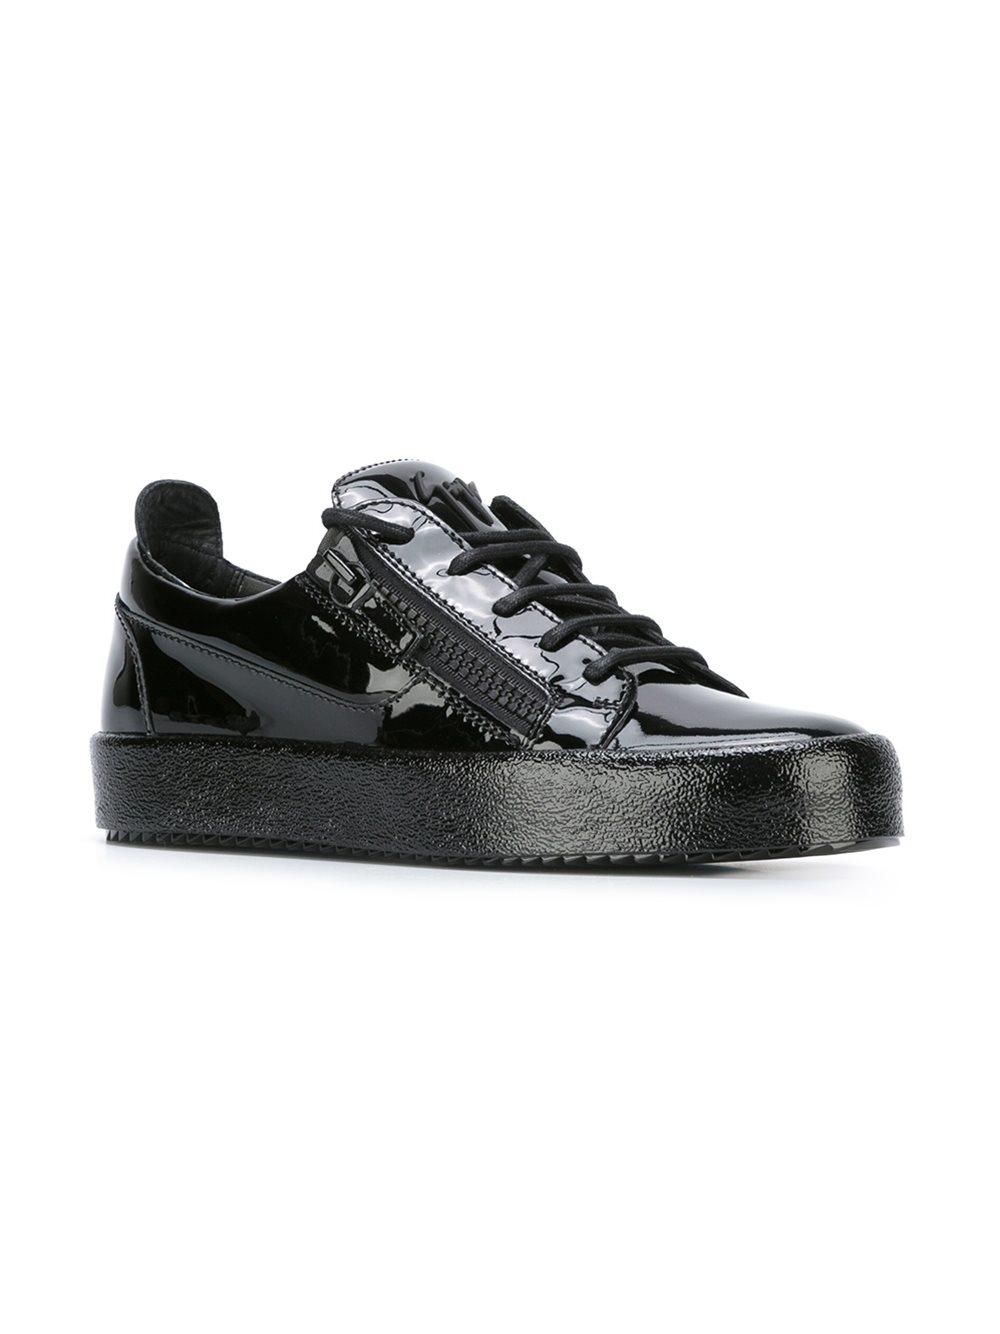 Giuseppe Zanotti Leather 'Vegas' Low-top Sneakers in Black for Men